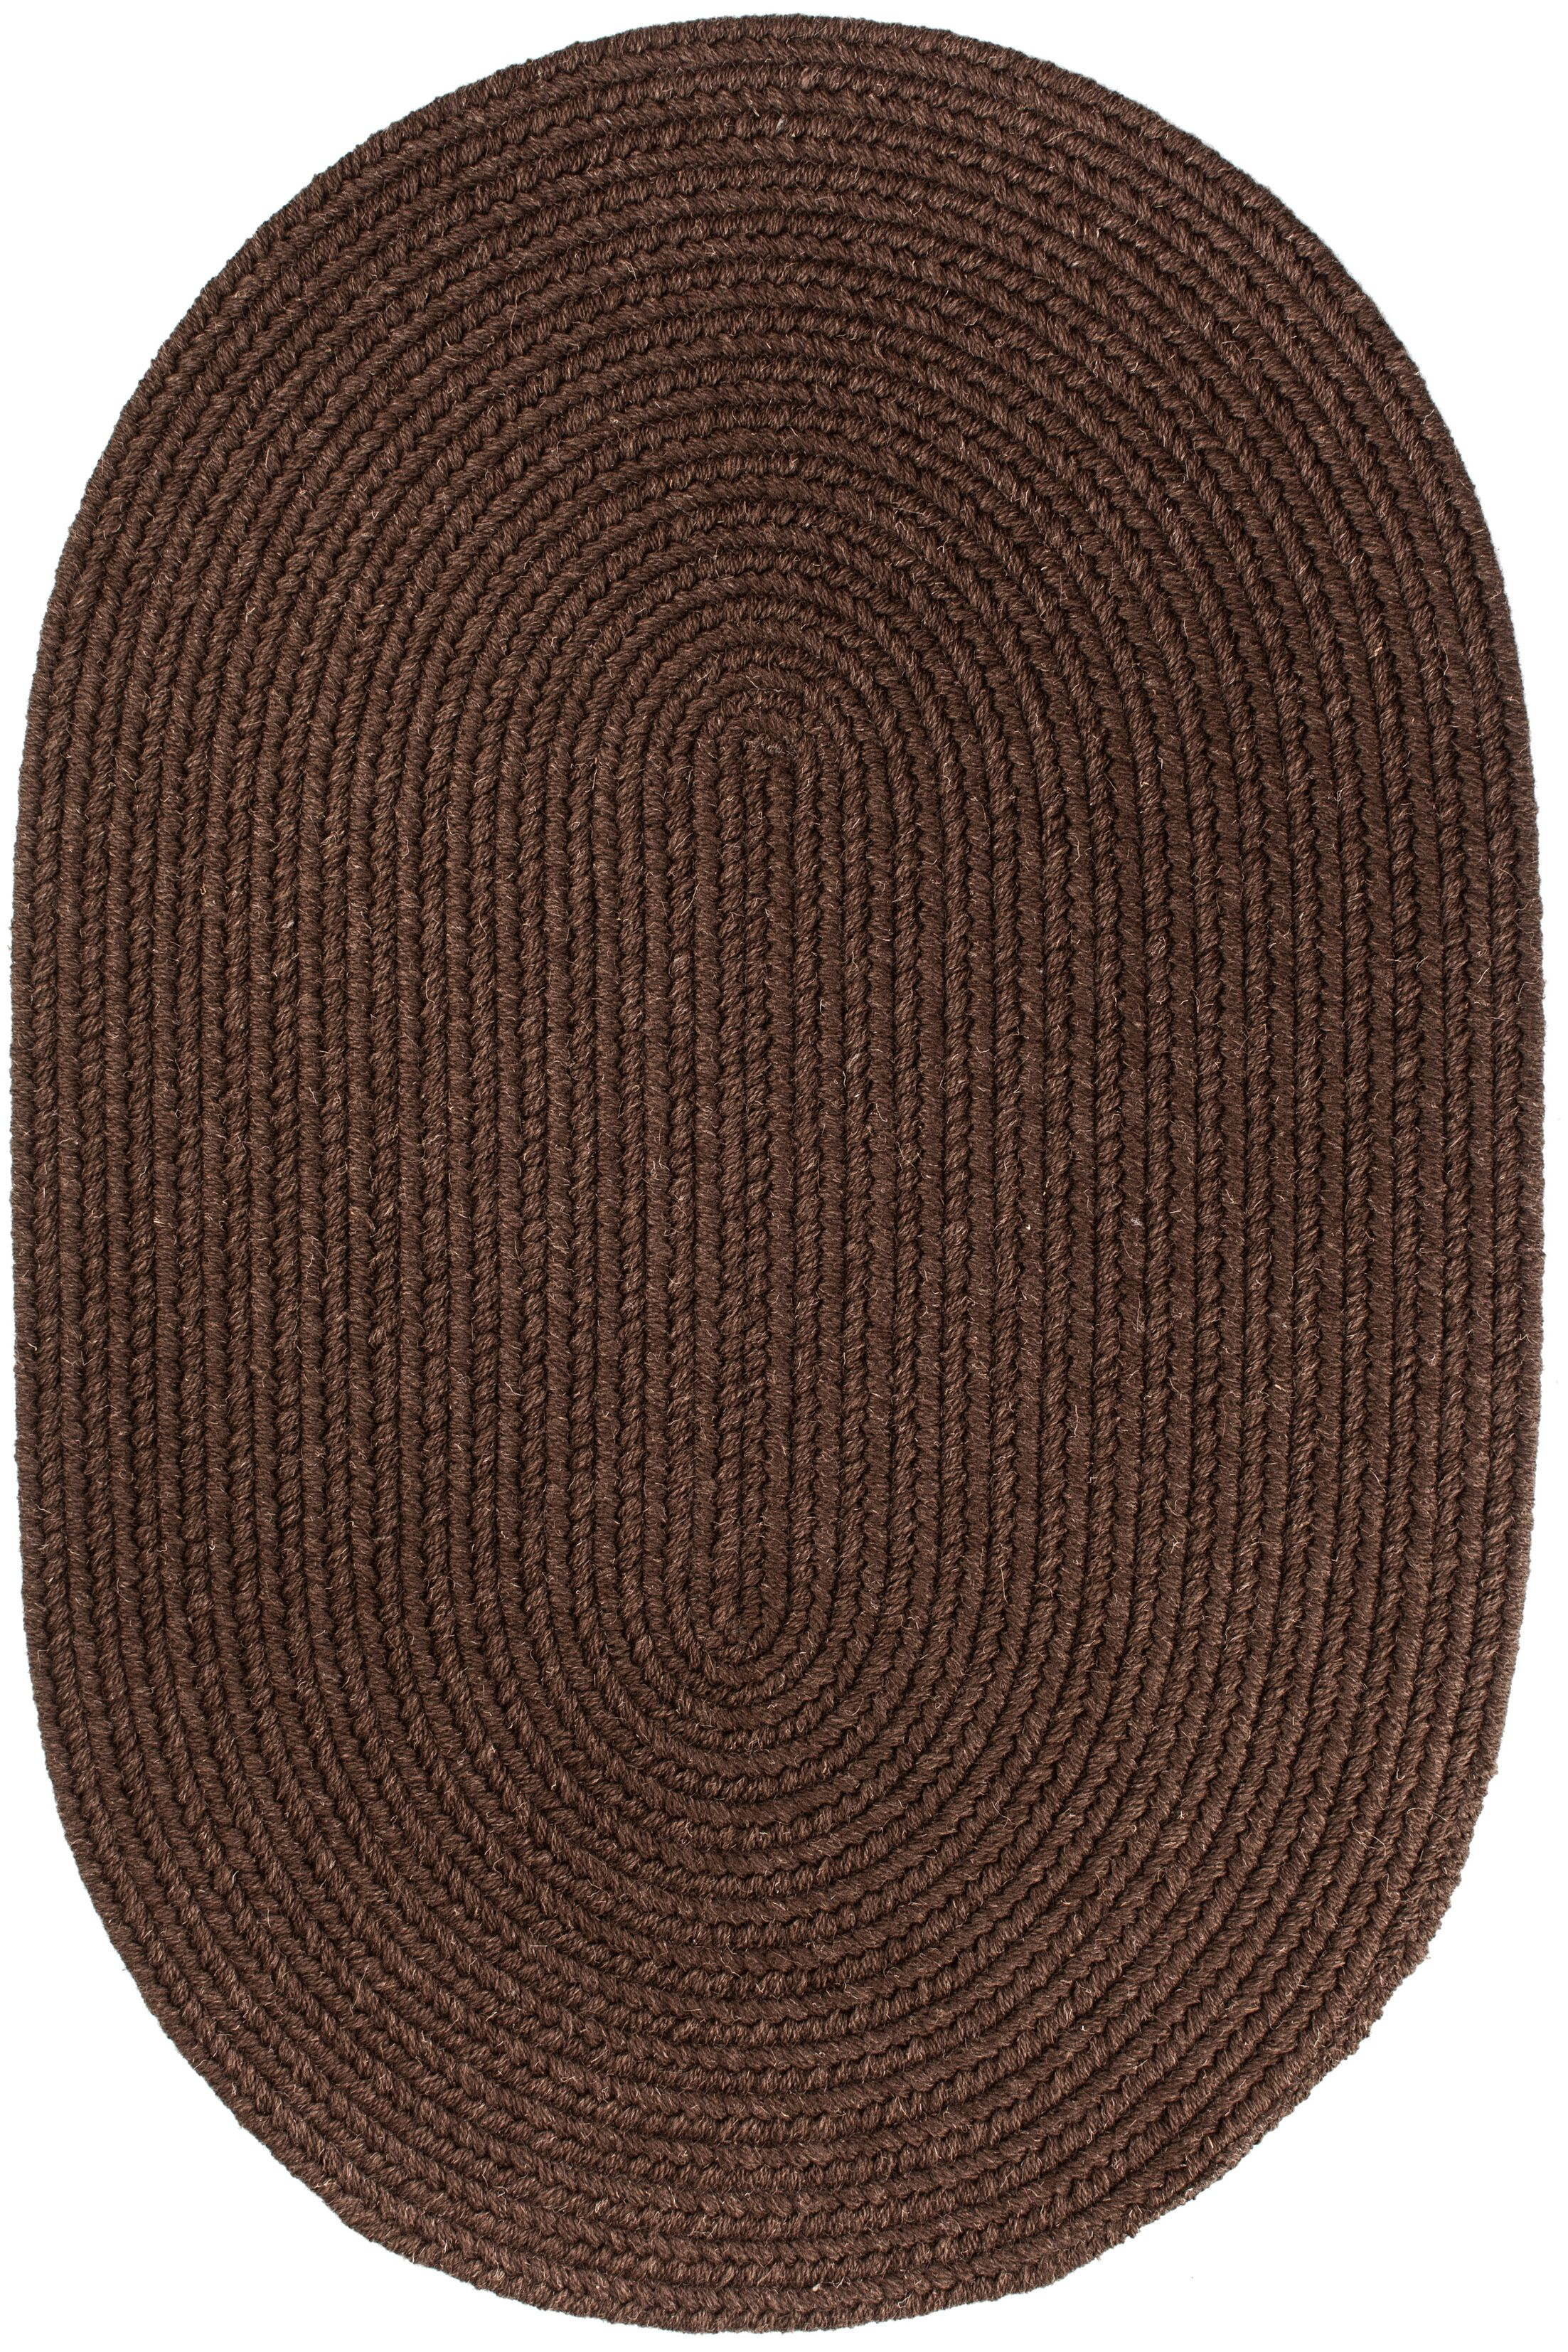 Handmade Brown Area Rug Rug Size: Oval  10' x 13'